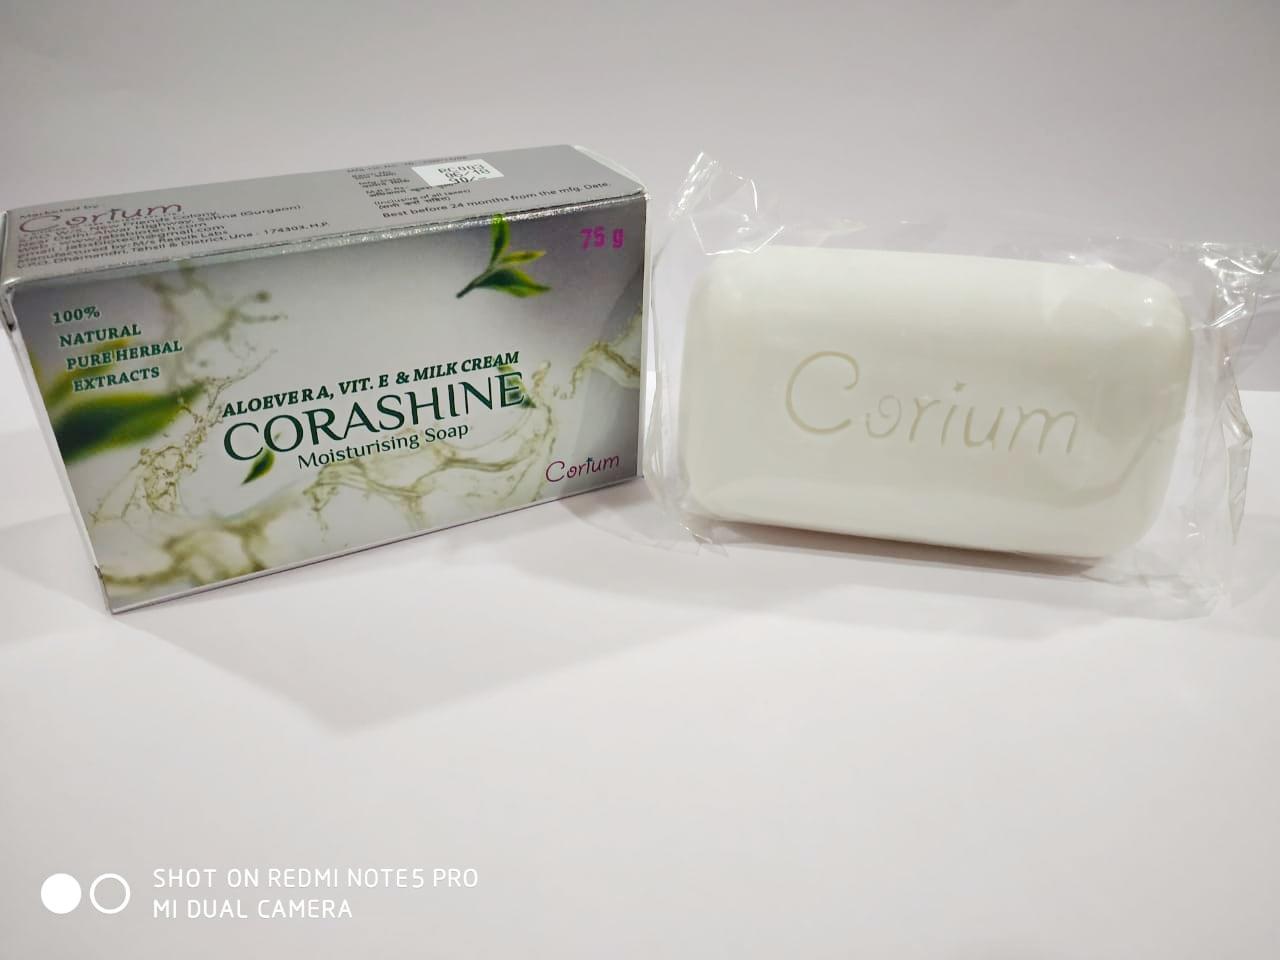 CORASHINE